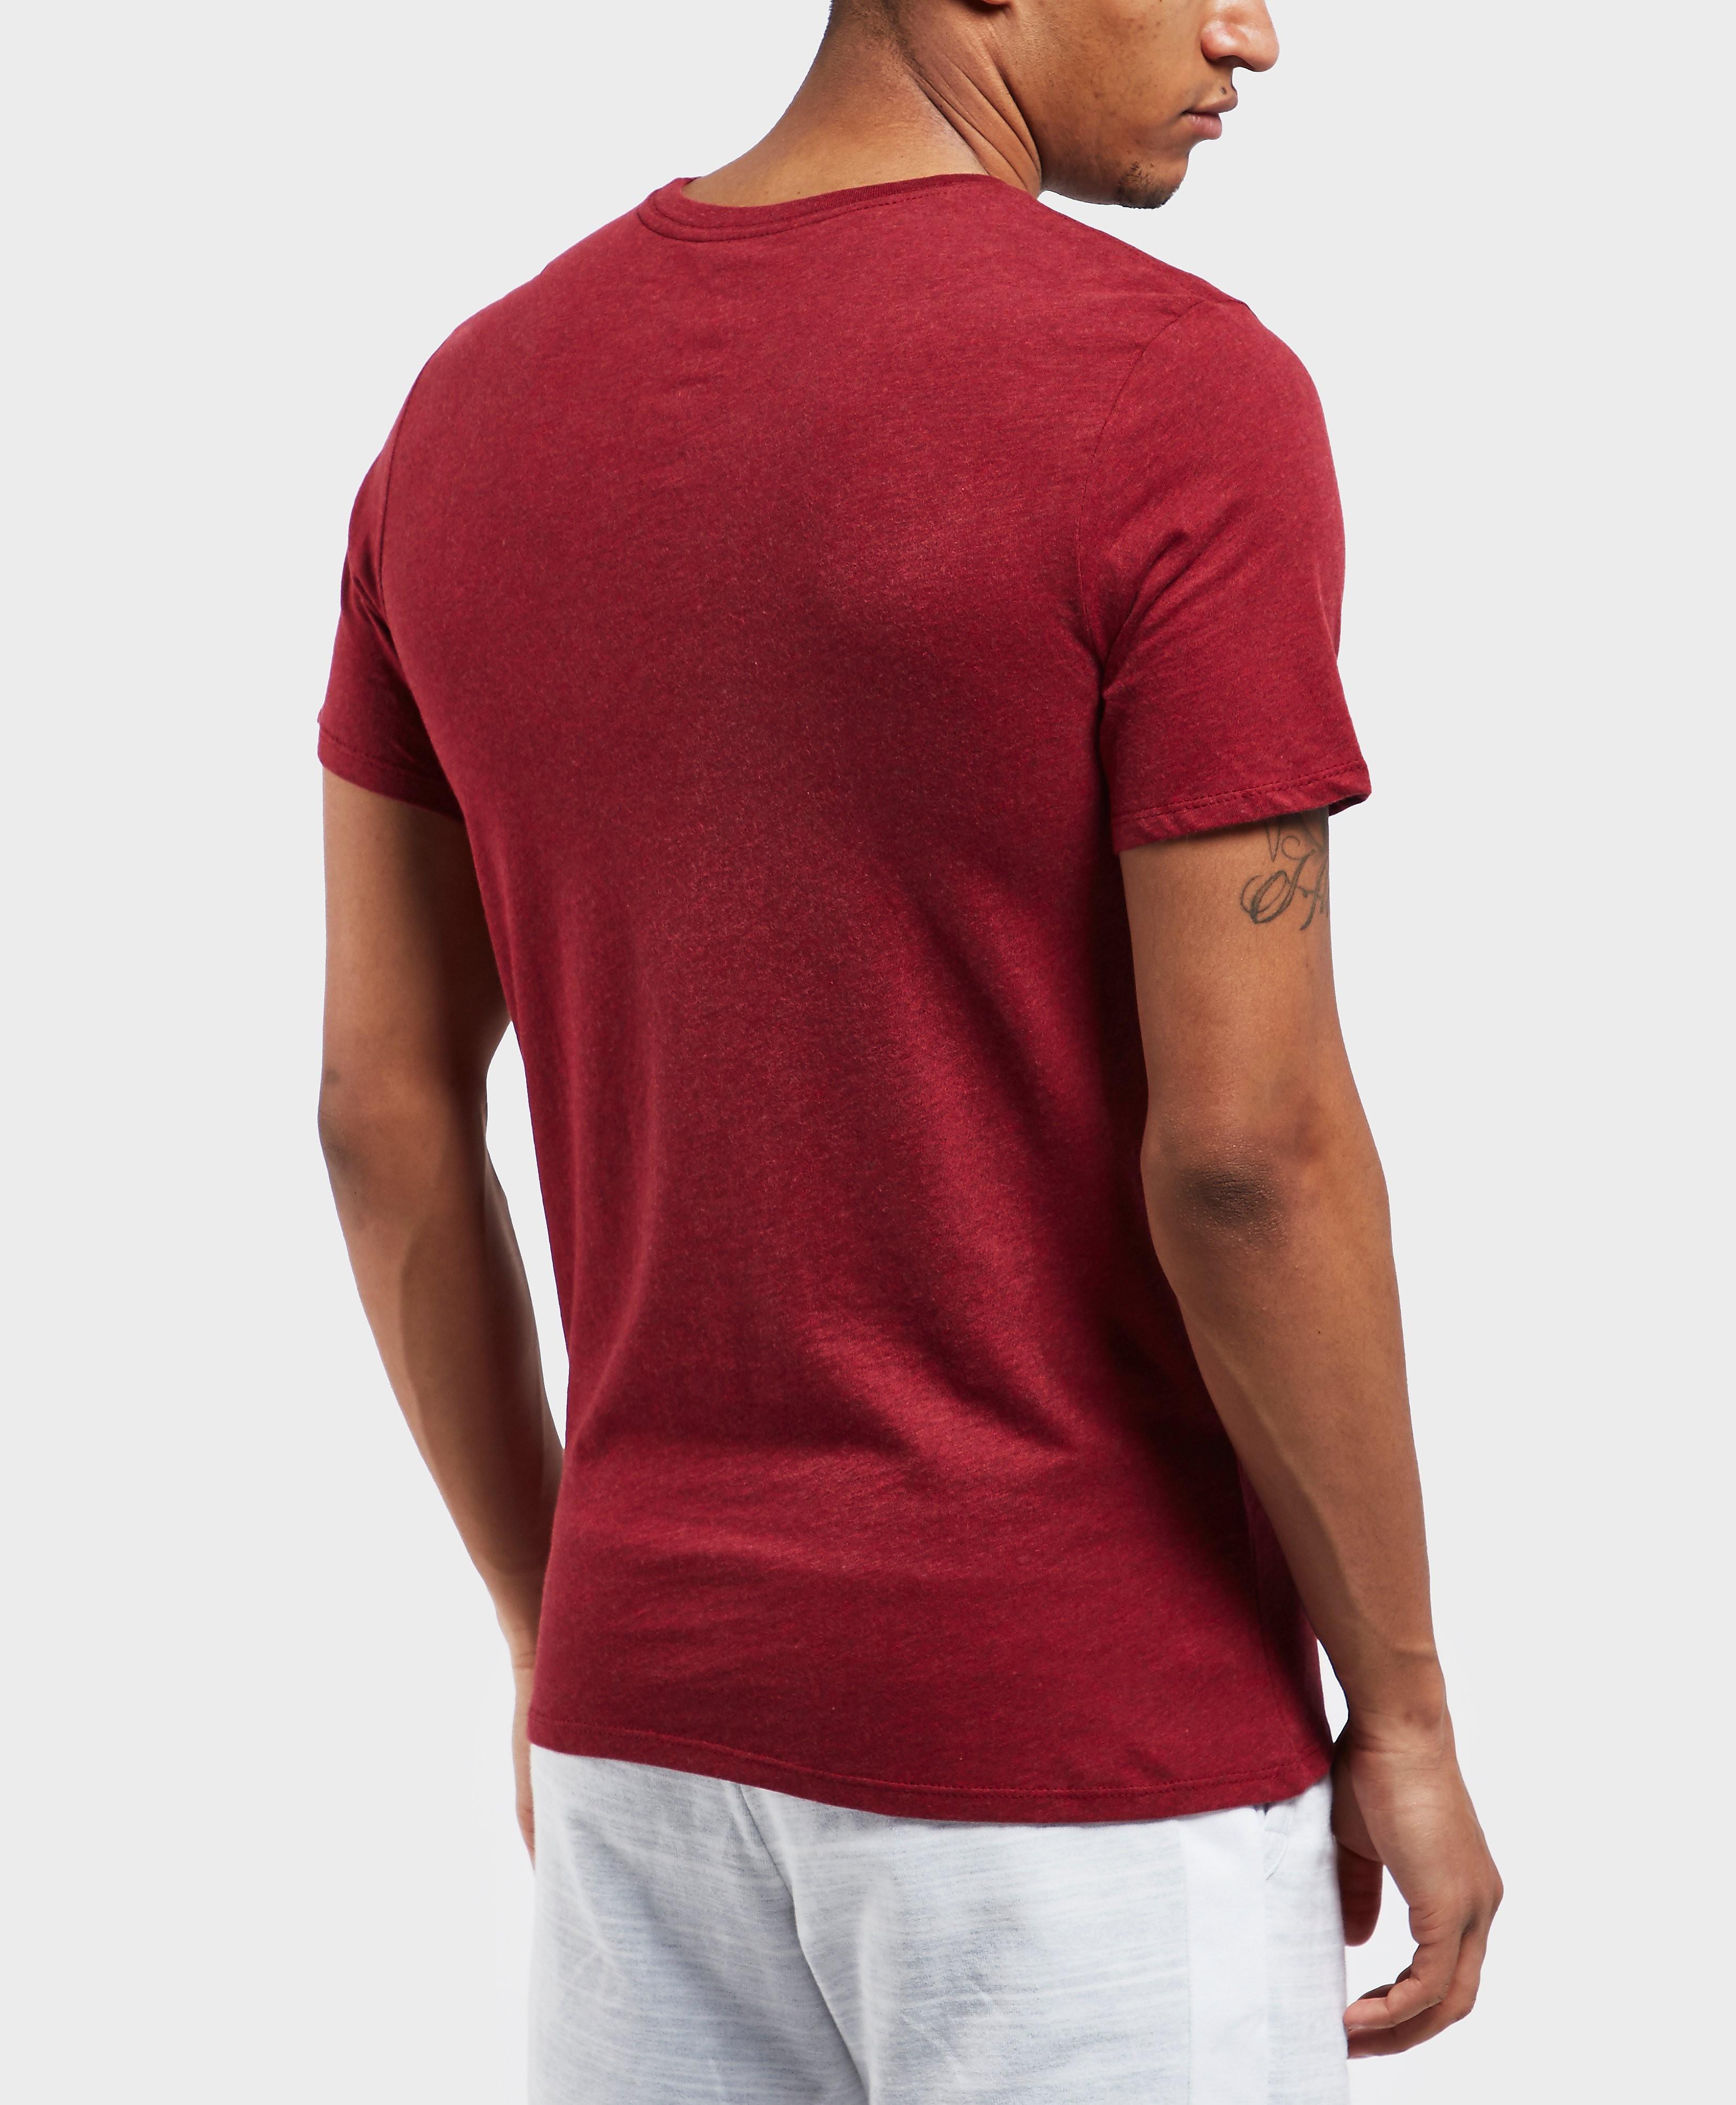 Nike Modern Short Sleeve T-Shirt